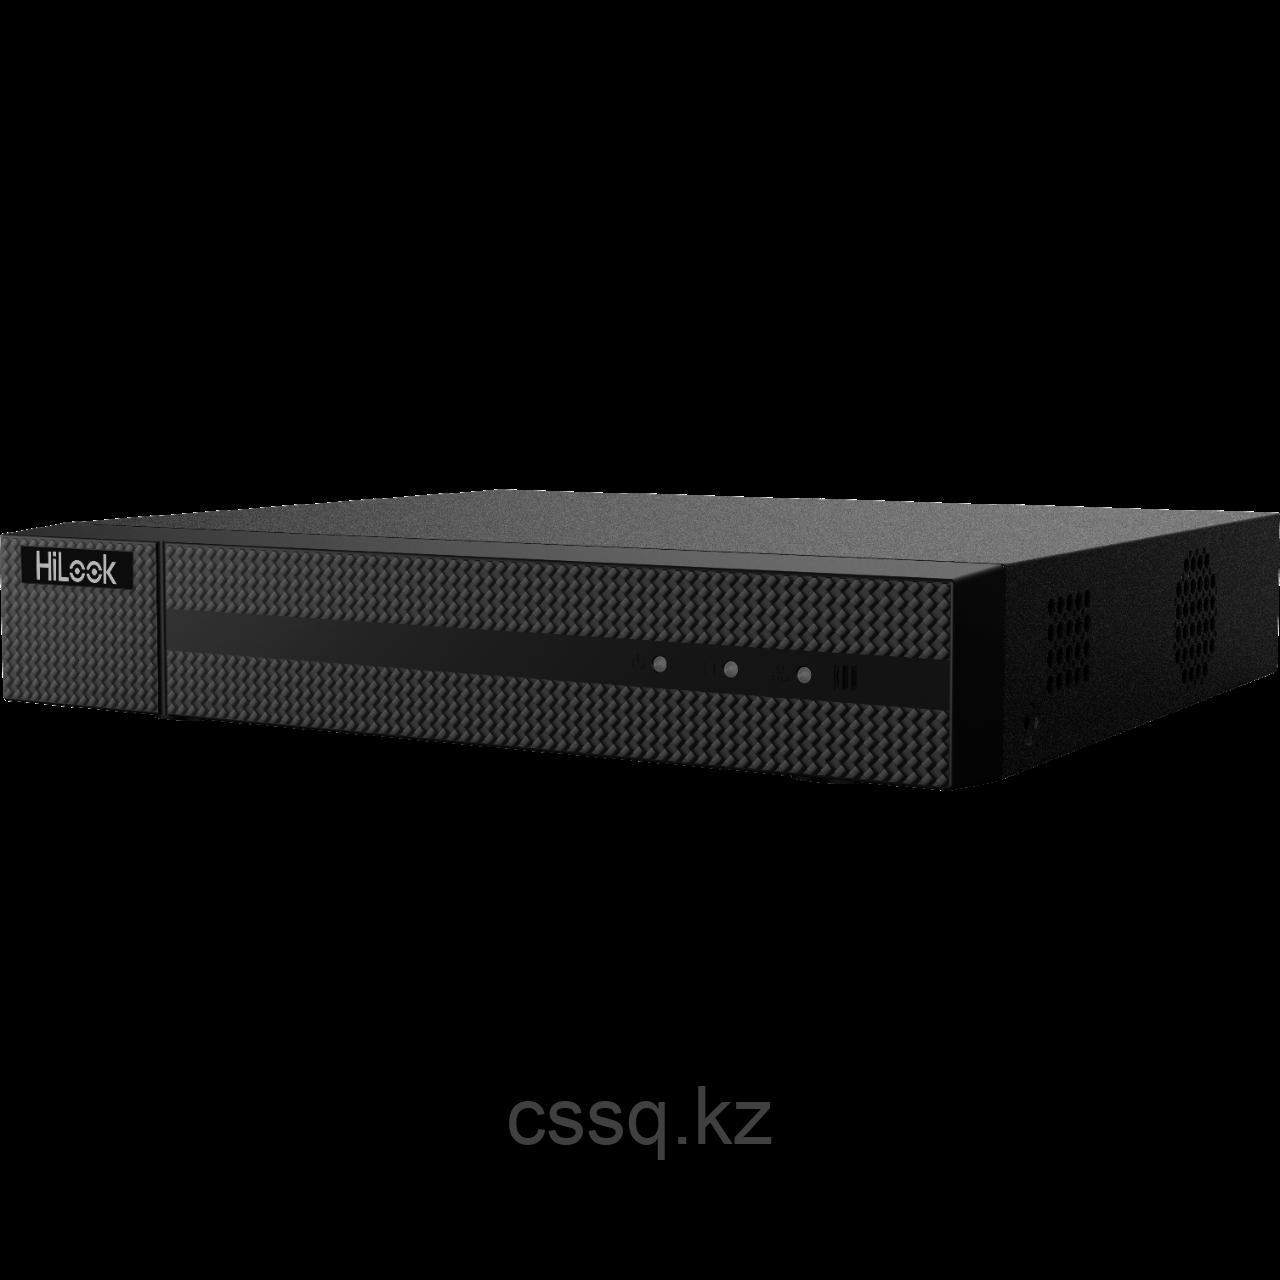 HiLook NVR-108MH-C  IP сетевой видеорегистратор